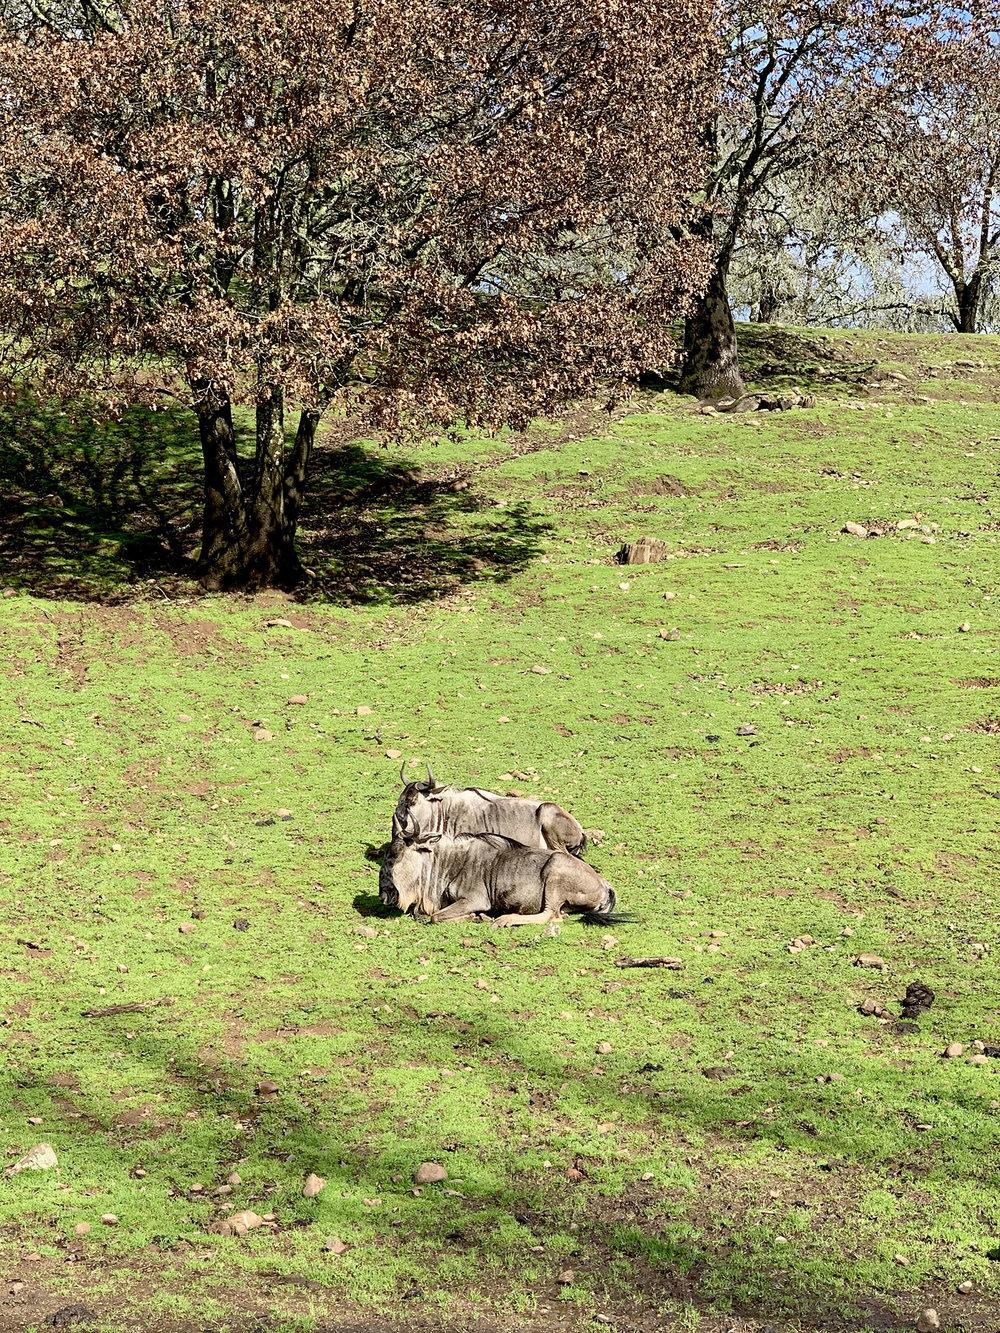 Safari West wildebeests